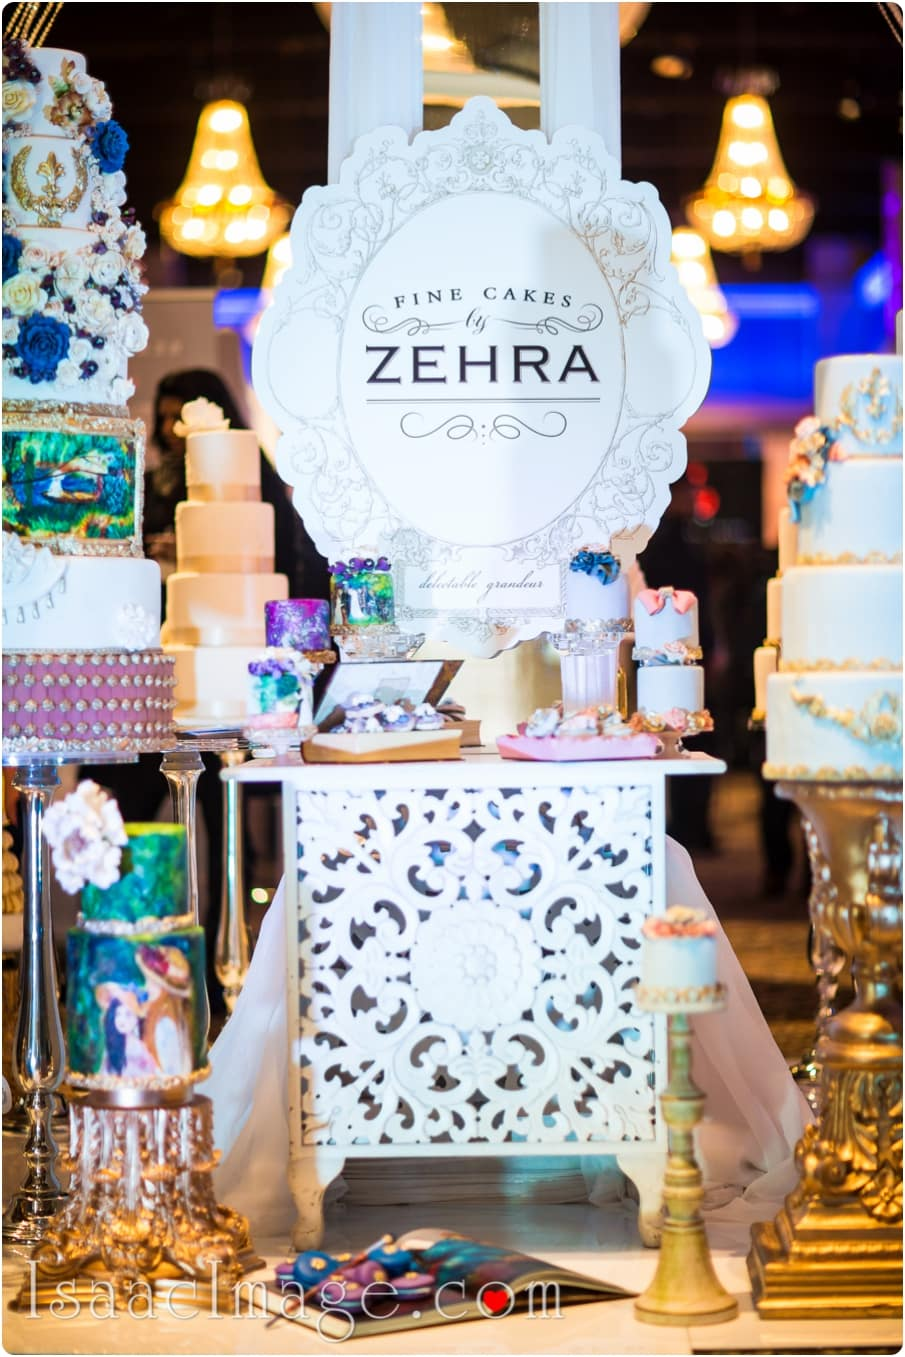 zehra cackes